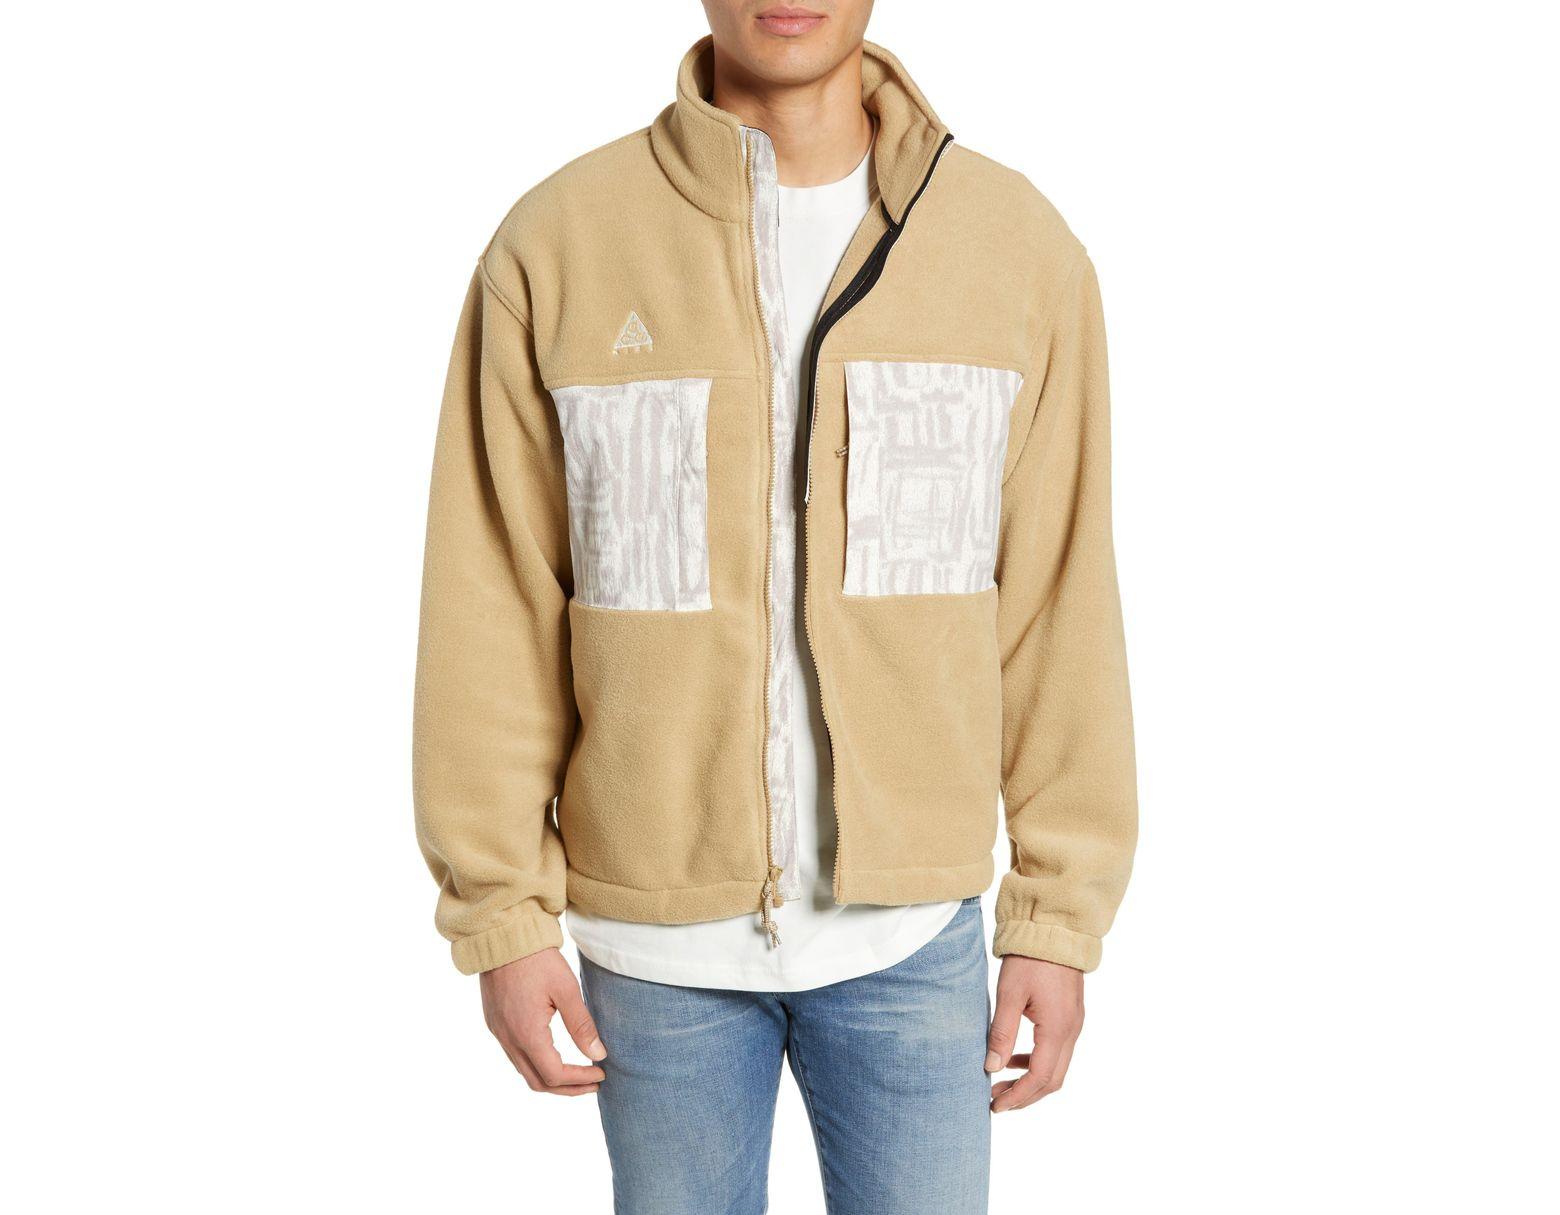 f03377a75f Nike Acg Men's Fleece Jacket in Natural for Men - Lyst